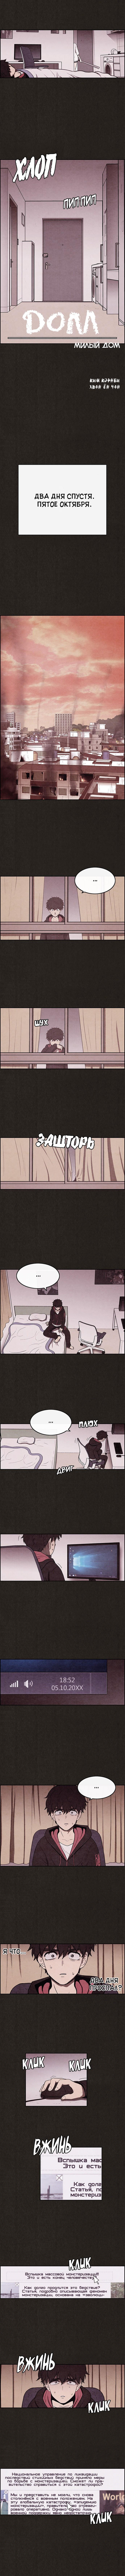 https://r1.ninemanga.com/comics/pic2/26/33050/415971/1532297675811.jpg Page 3